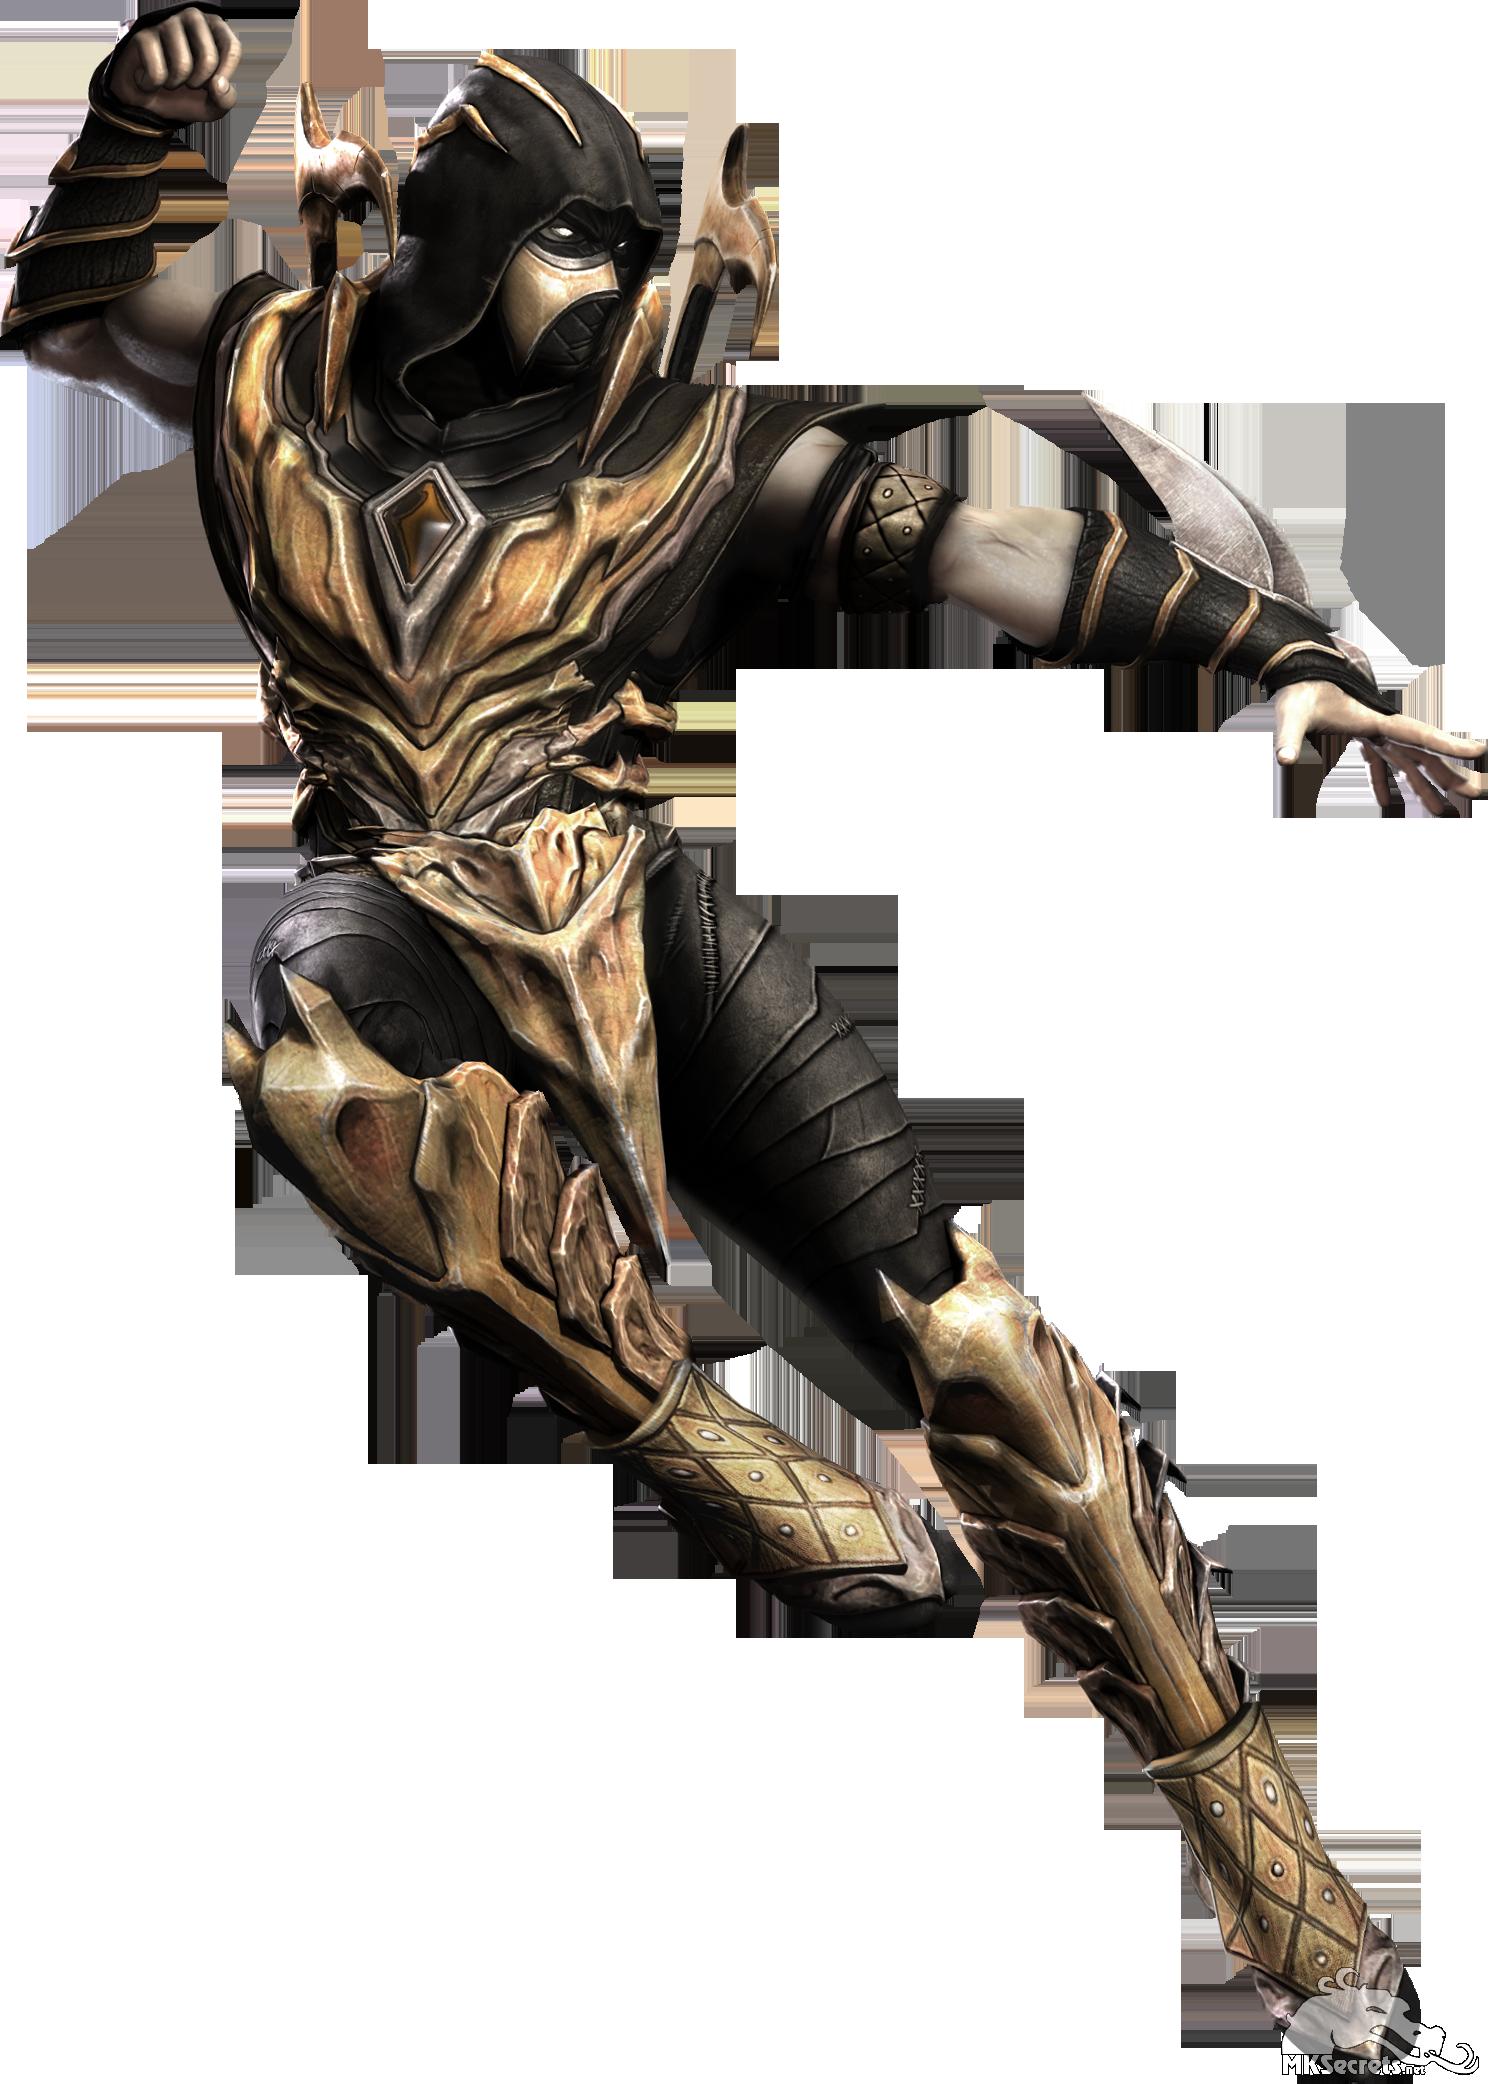 Mortal Kombat's Scorpion Injustice costume. This is my